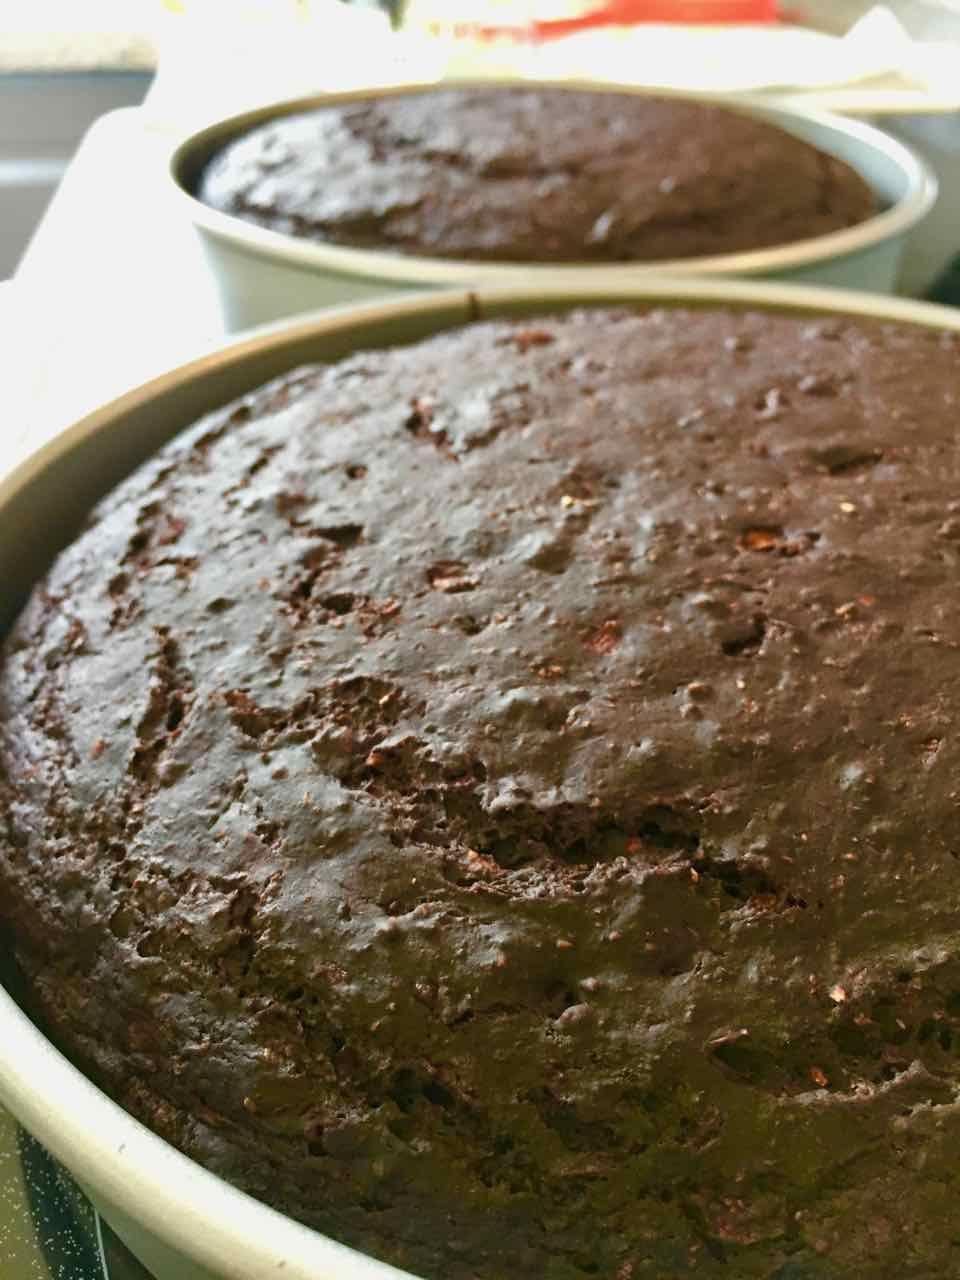 Healthy Aqua Faba Vegan Chocolate Birthday Cake Fat Free Whole Wheat